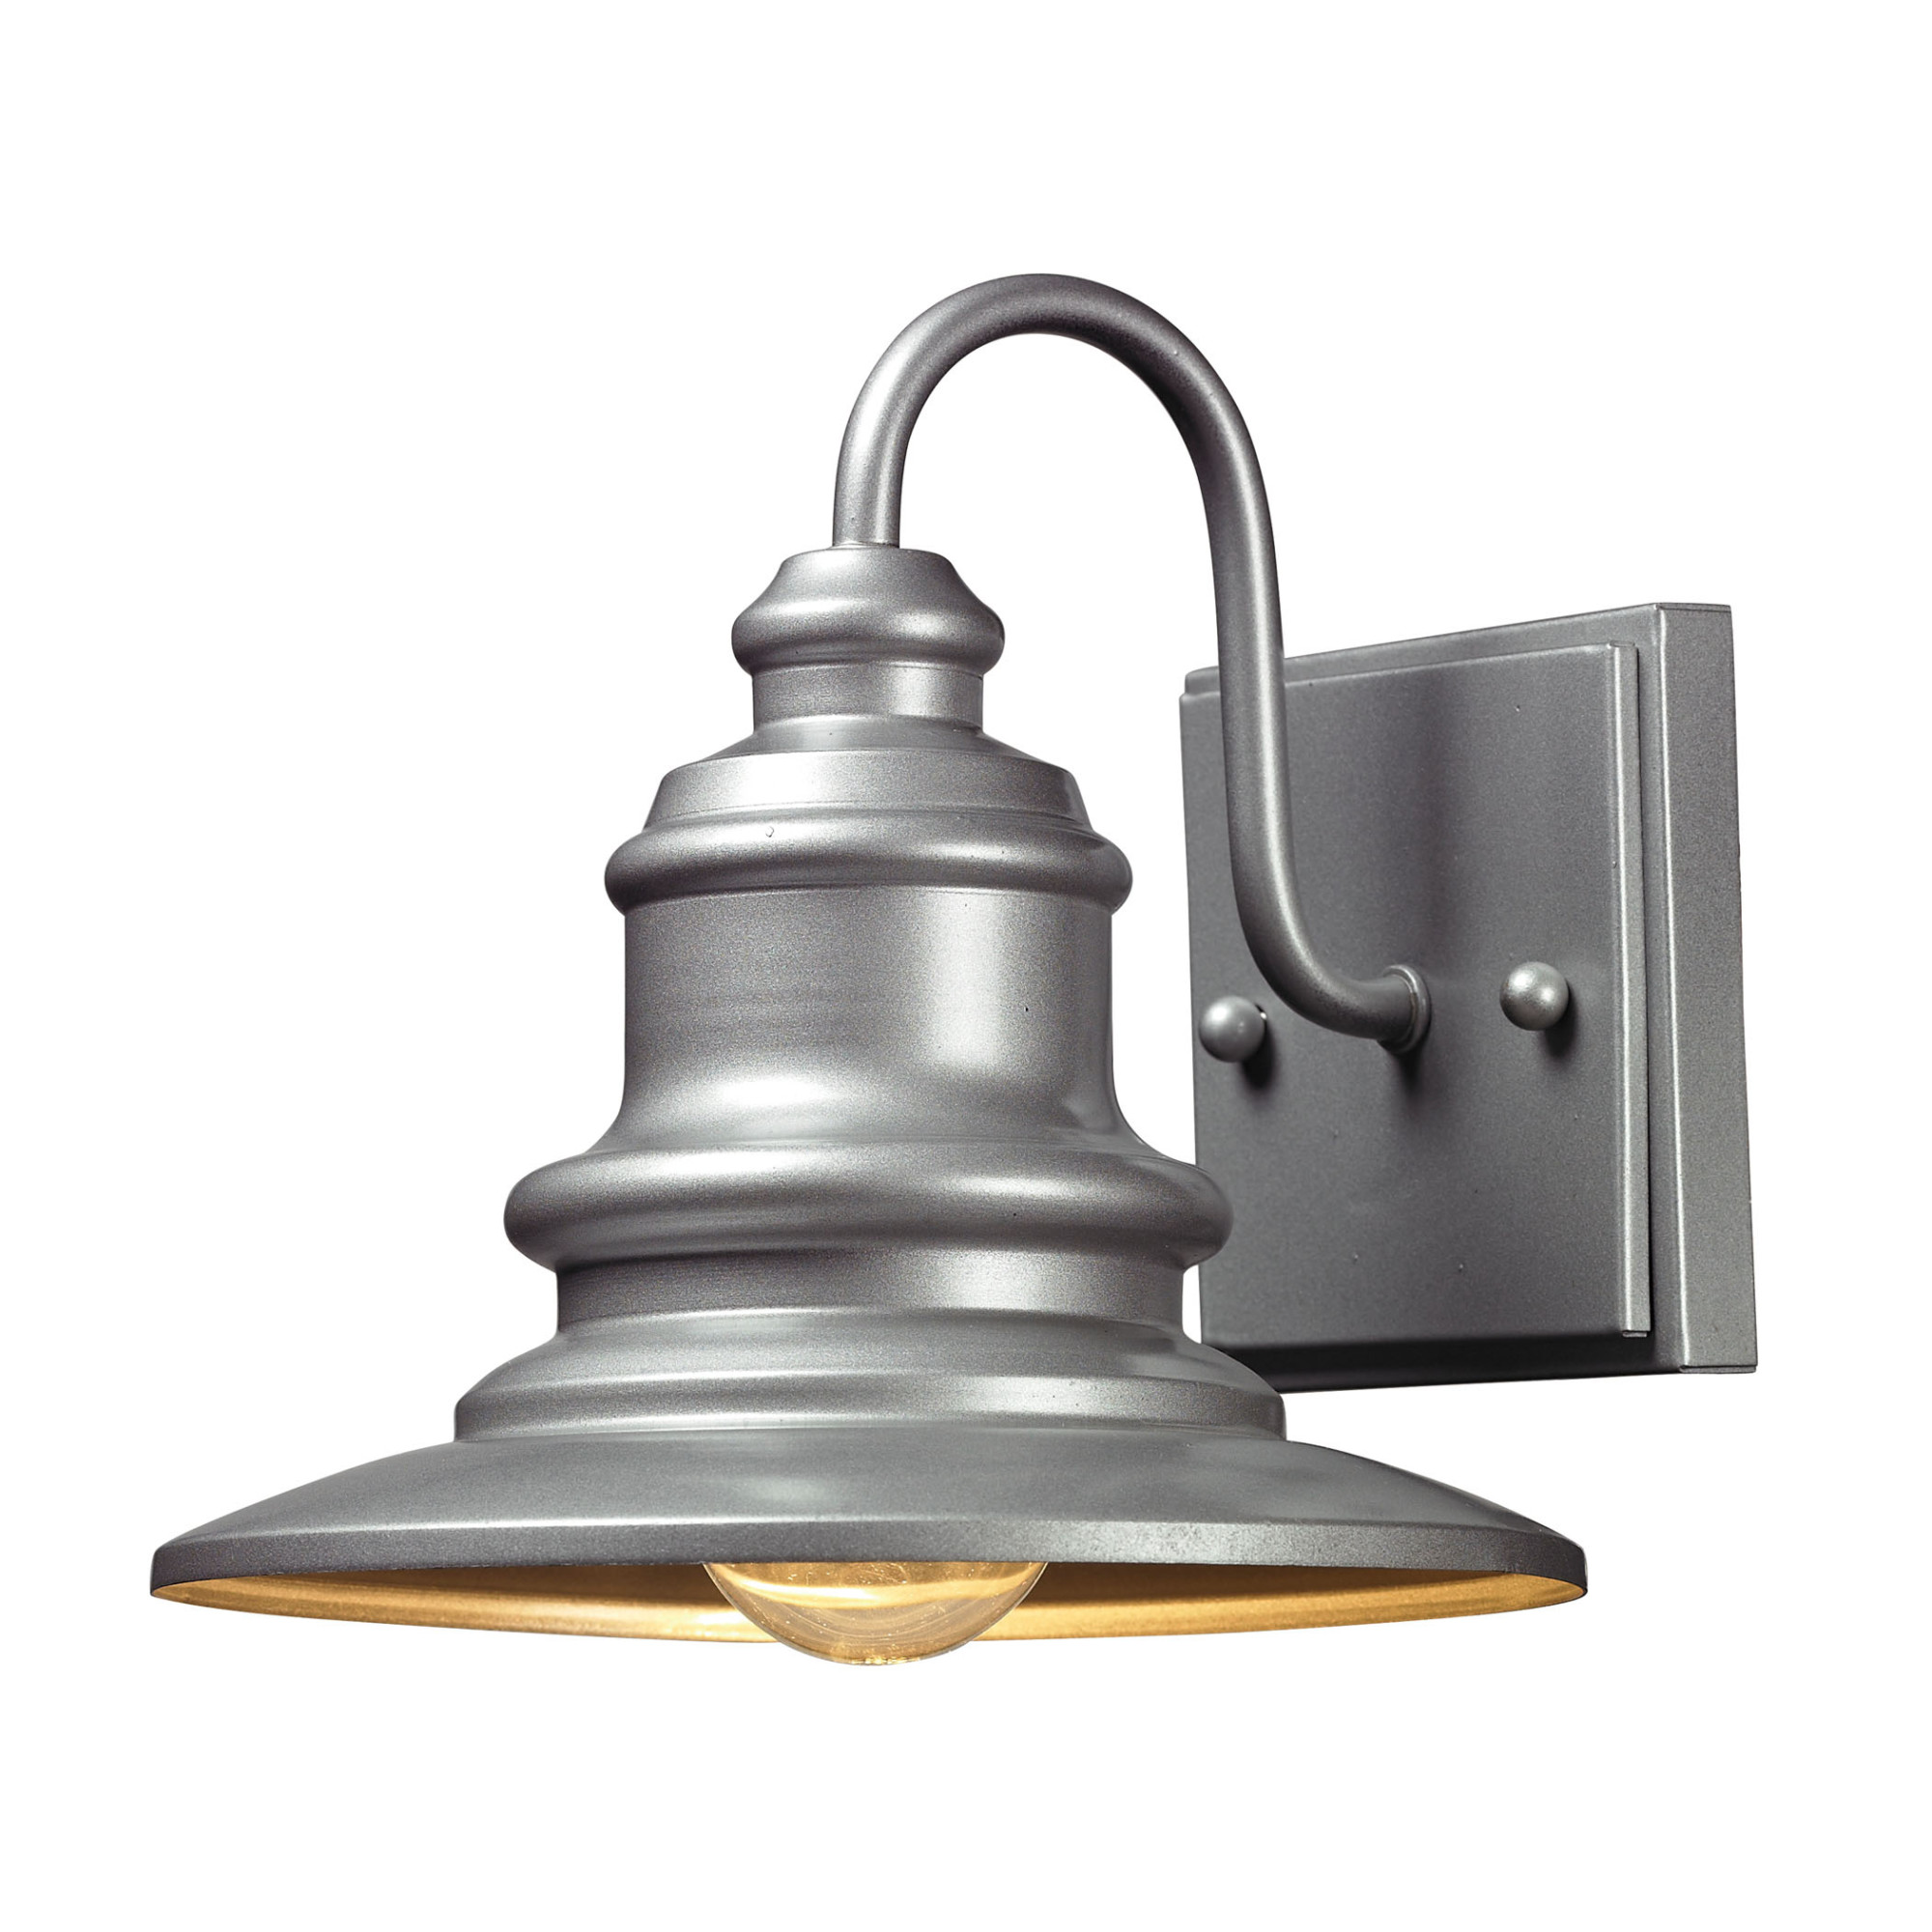 Elk Lighting 47020 1 Matte Silver